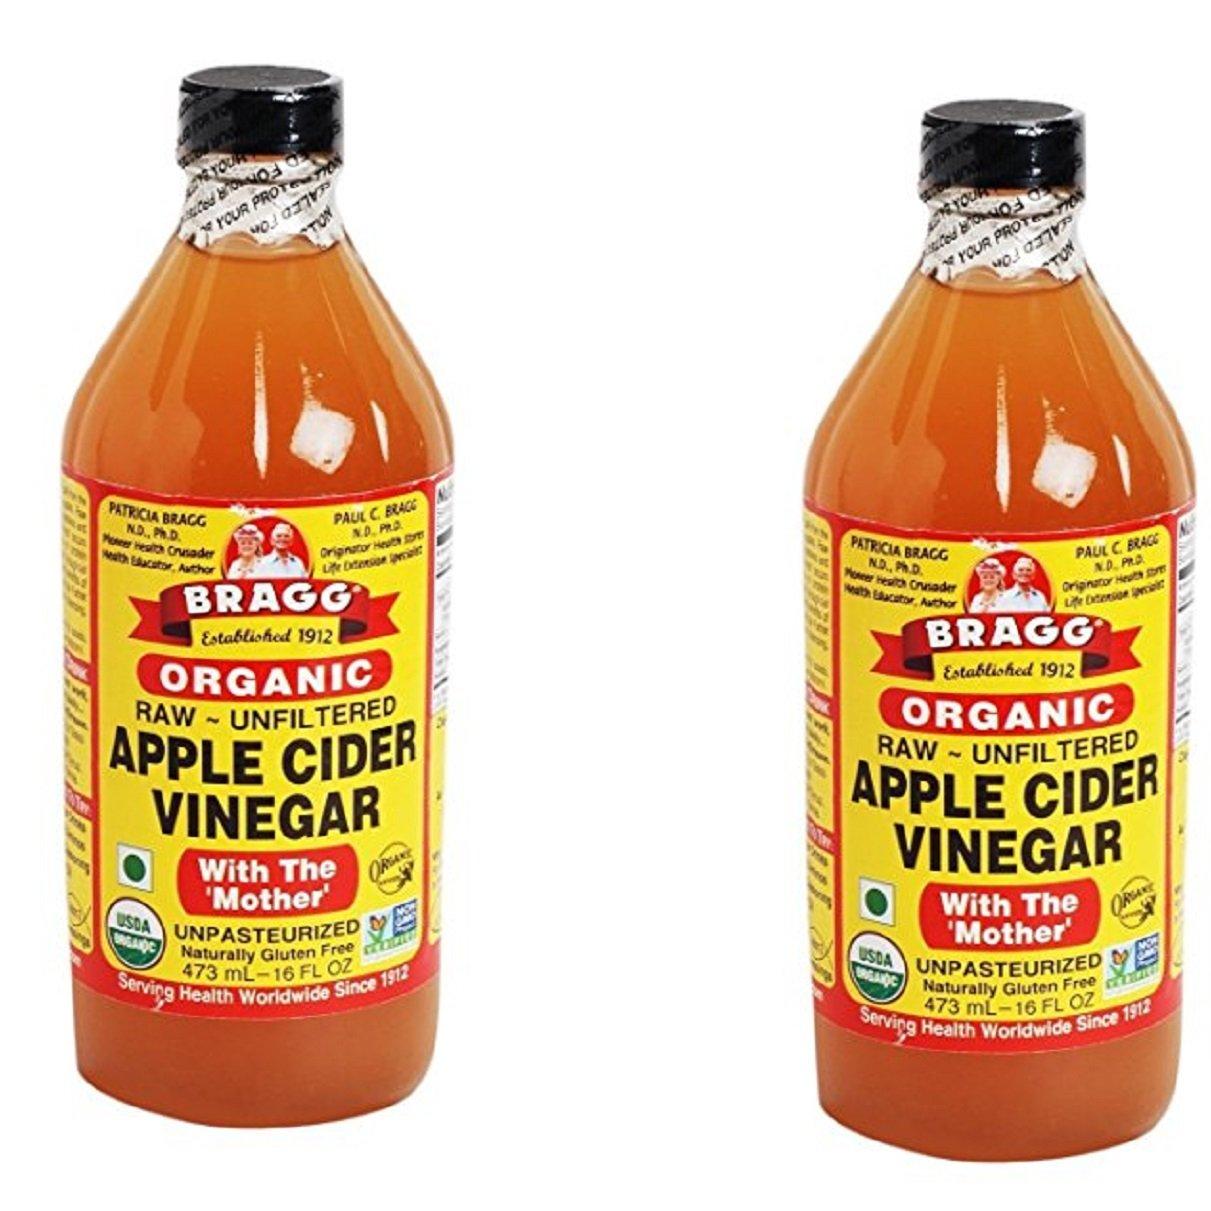 Bragg USDA Gluten Free Organic Raw Apple Cider Vinegar, With the Mother zPACaT, 2Pack (16 oz)